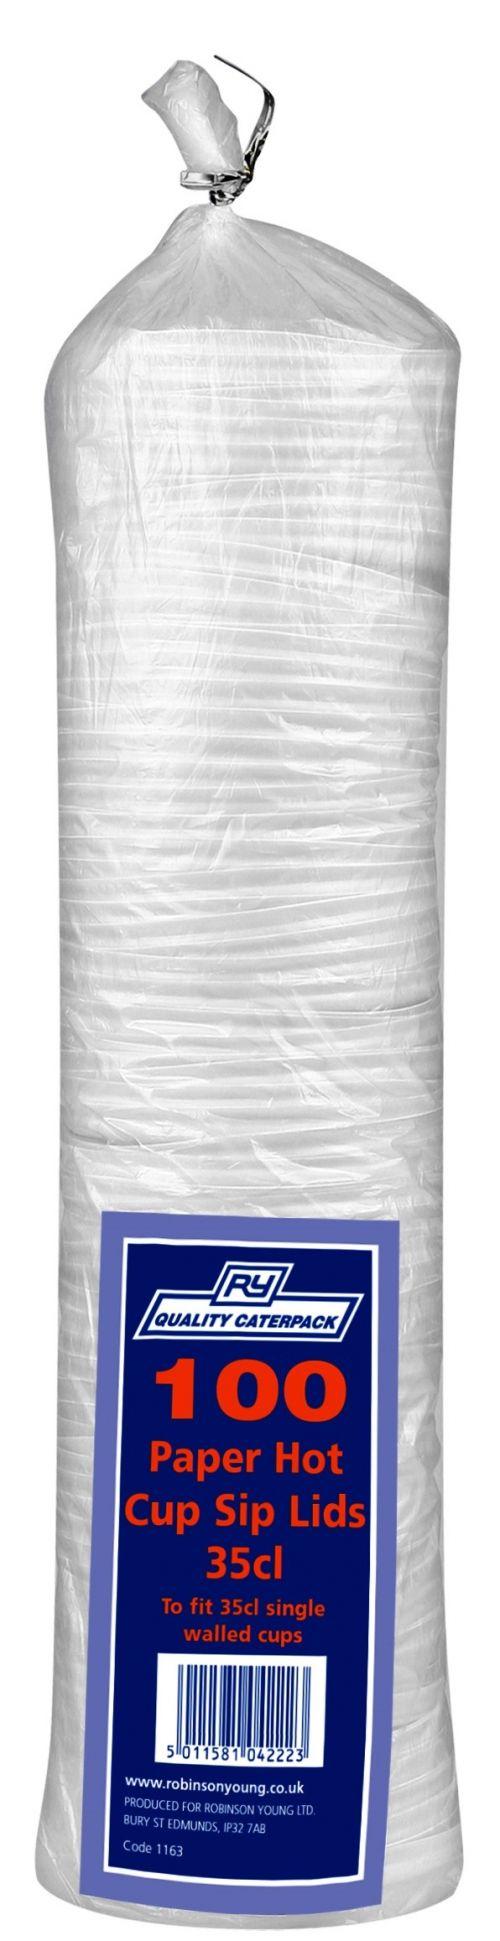 Caterpack 35cl Paper Cup Sip Lids Pk100